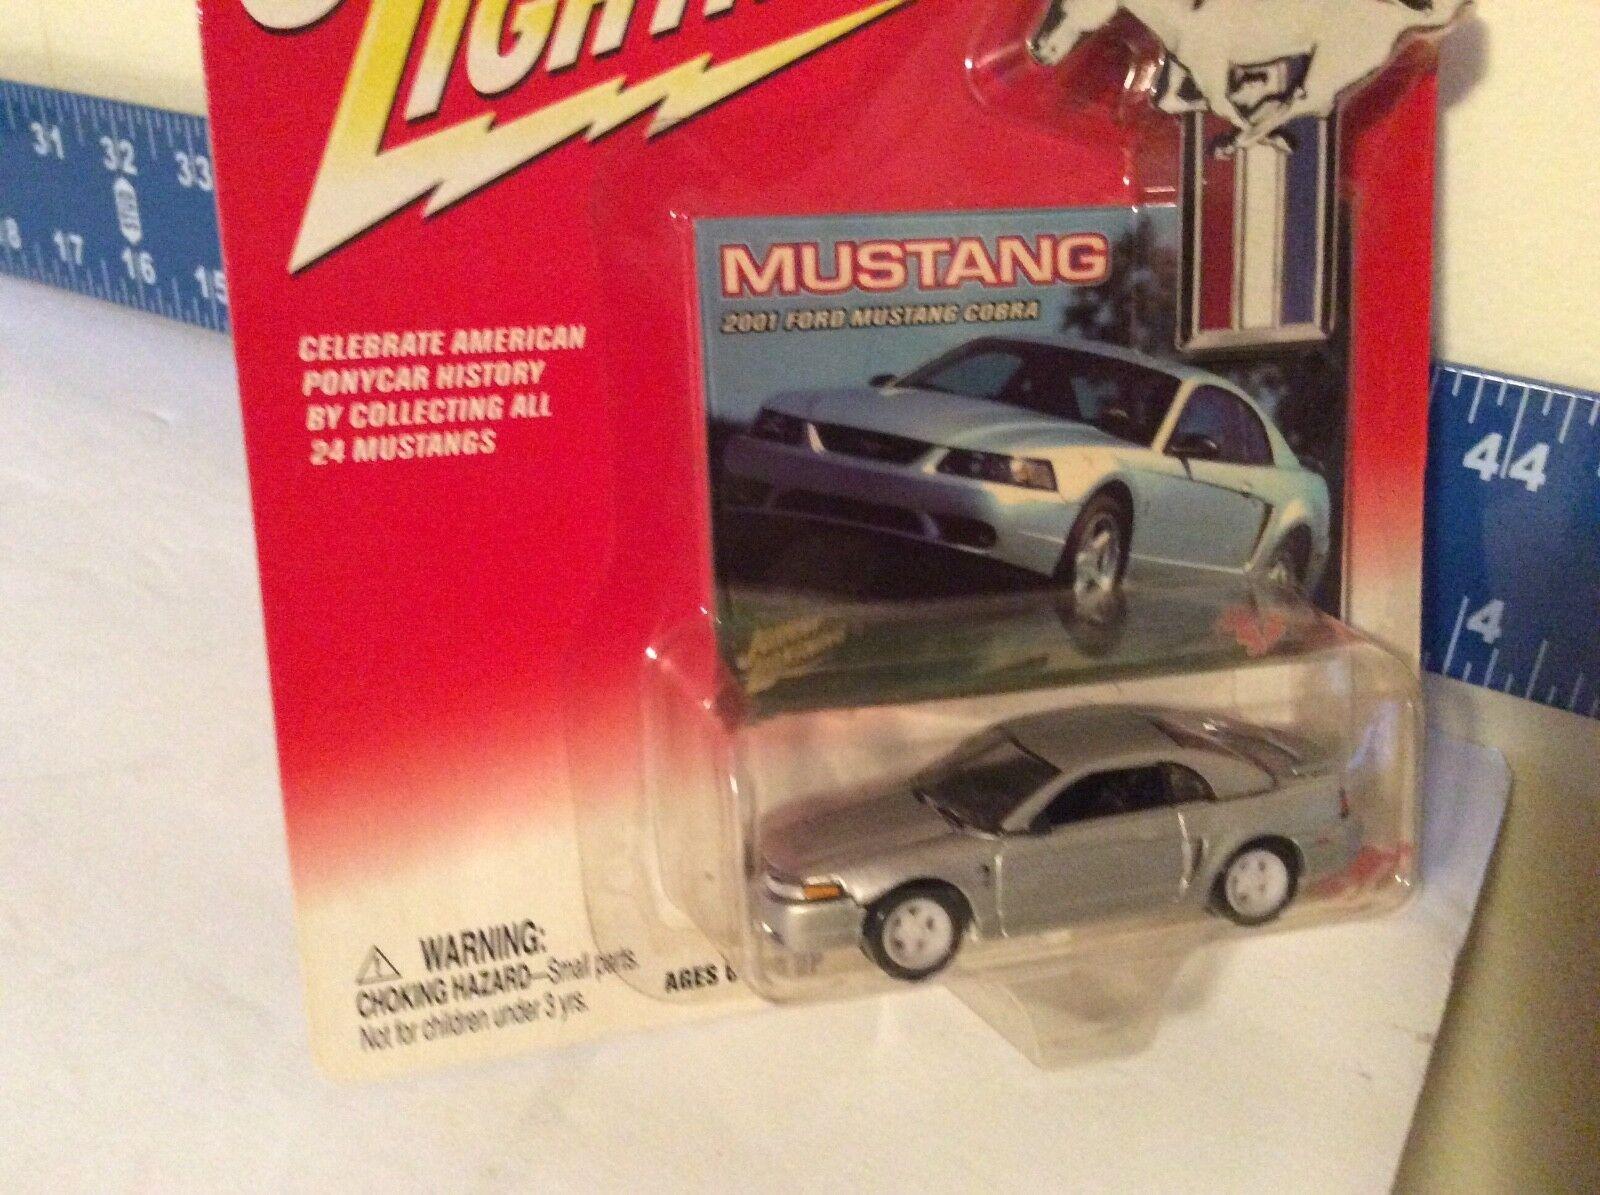 Johnny Fulmini 2001 Ford Mustang Cobra Jl 1 64 Bianco Telaio argentoo 2002